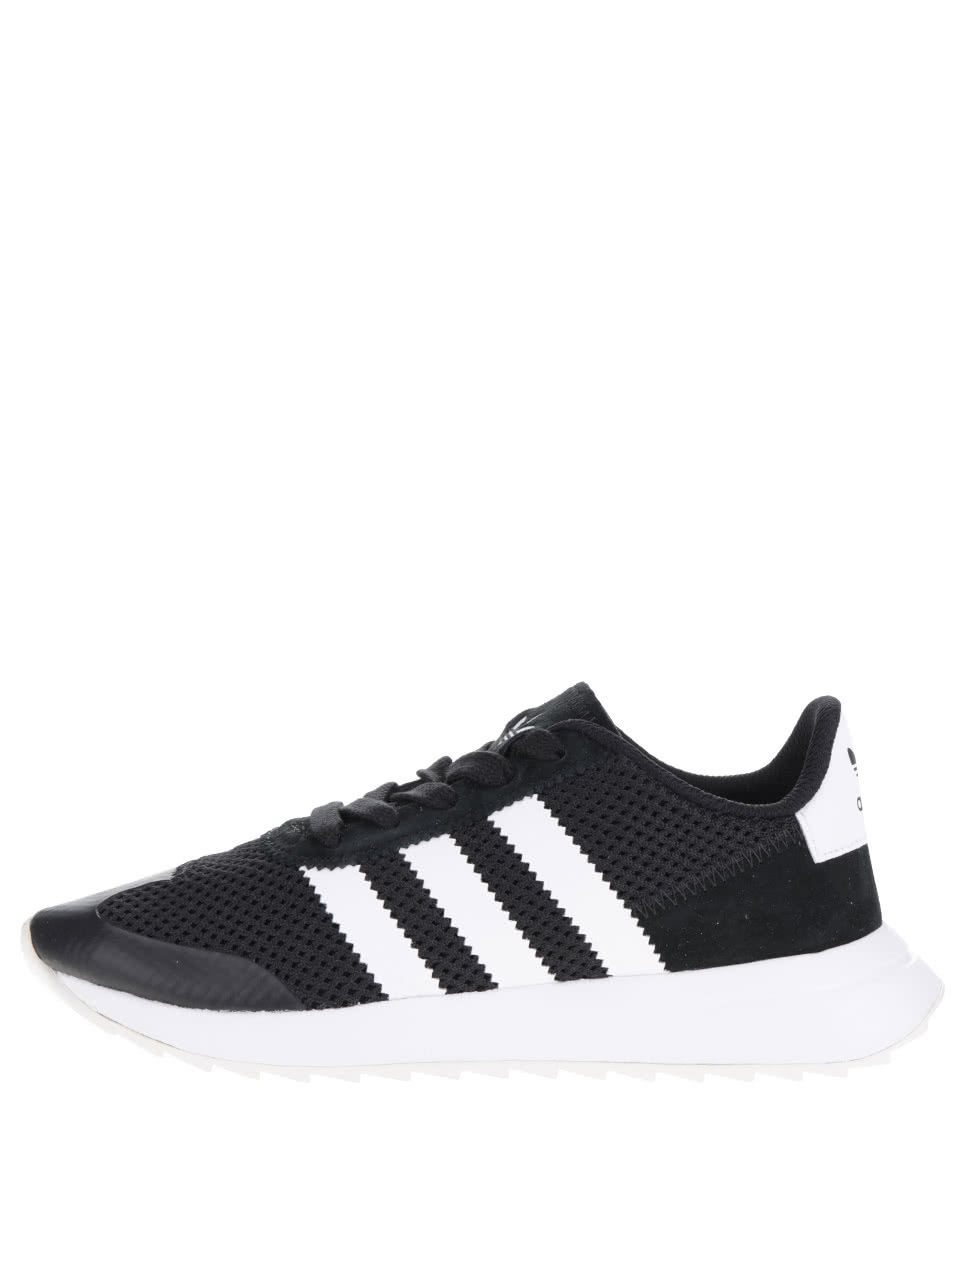 15265e429 Bielo-čierne dámske tenisky adidas Originals Flashback | ZOOT.sk